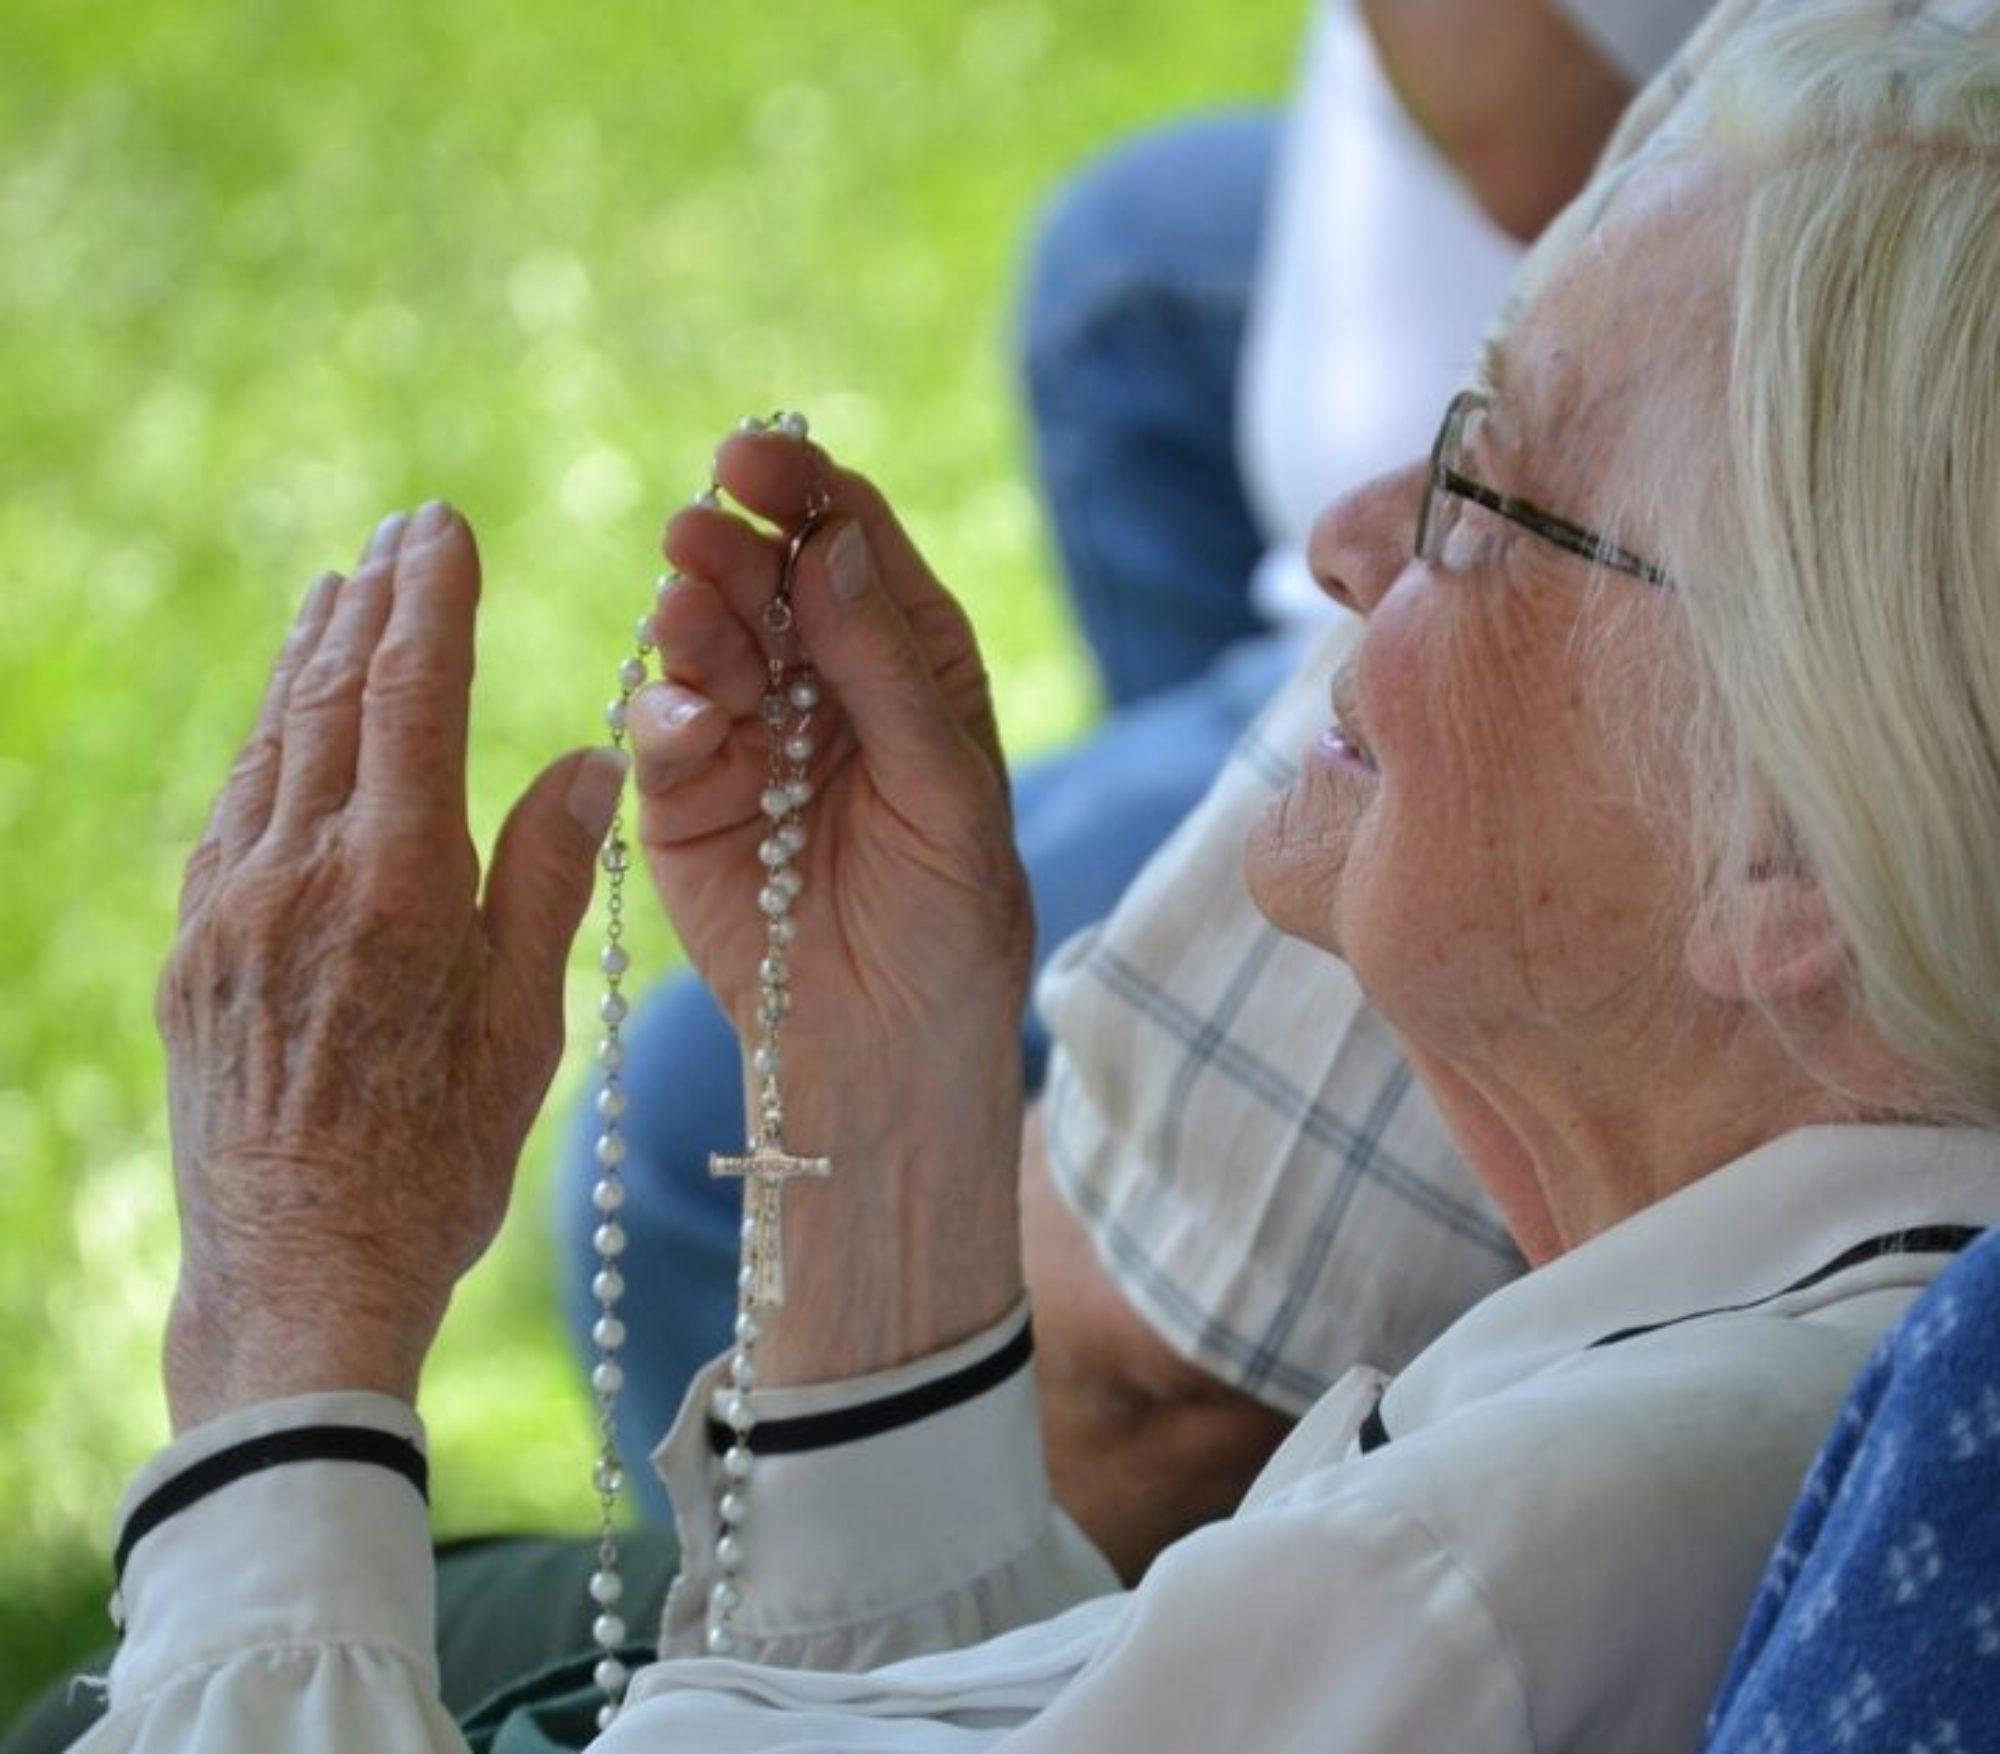 2018 Living Rosary May 12th, 11 am